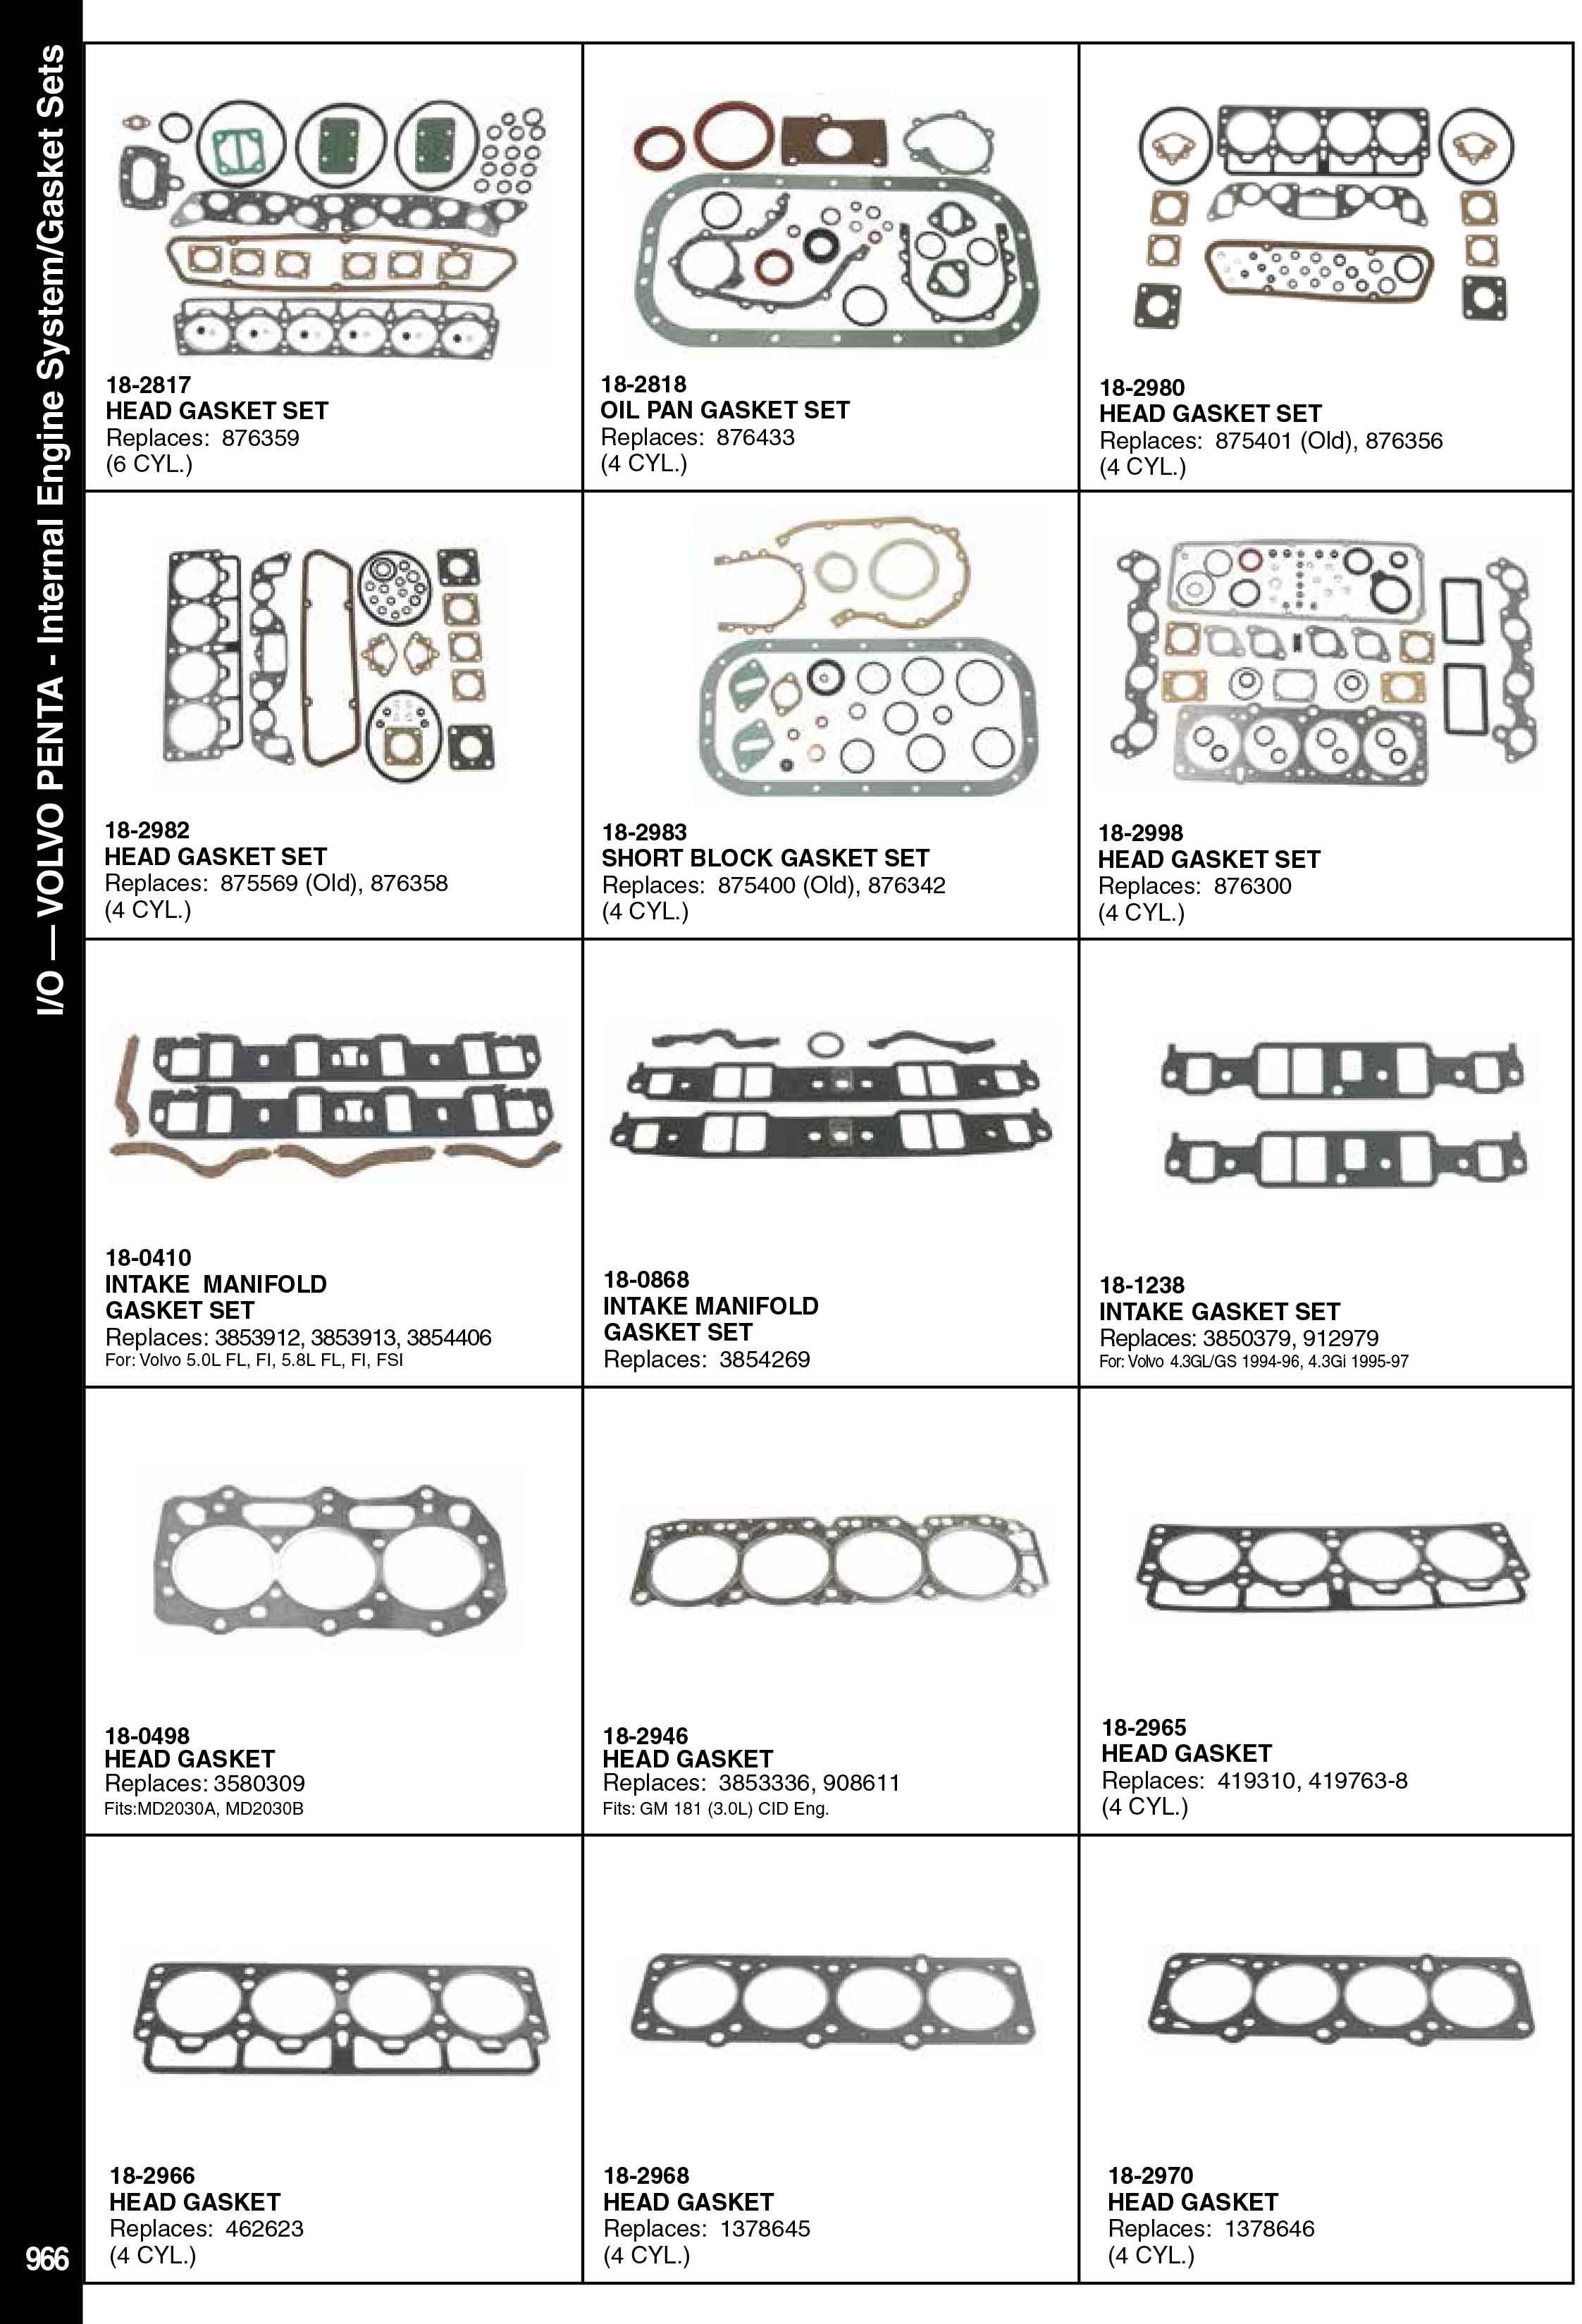 Volvo Penta Deniz Motoru Conta Takımı ve Kitleri